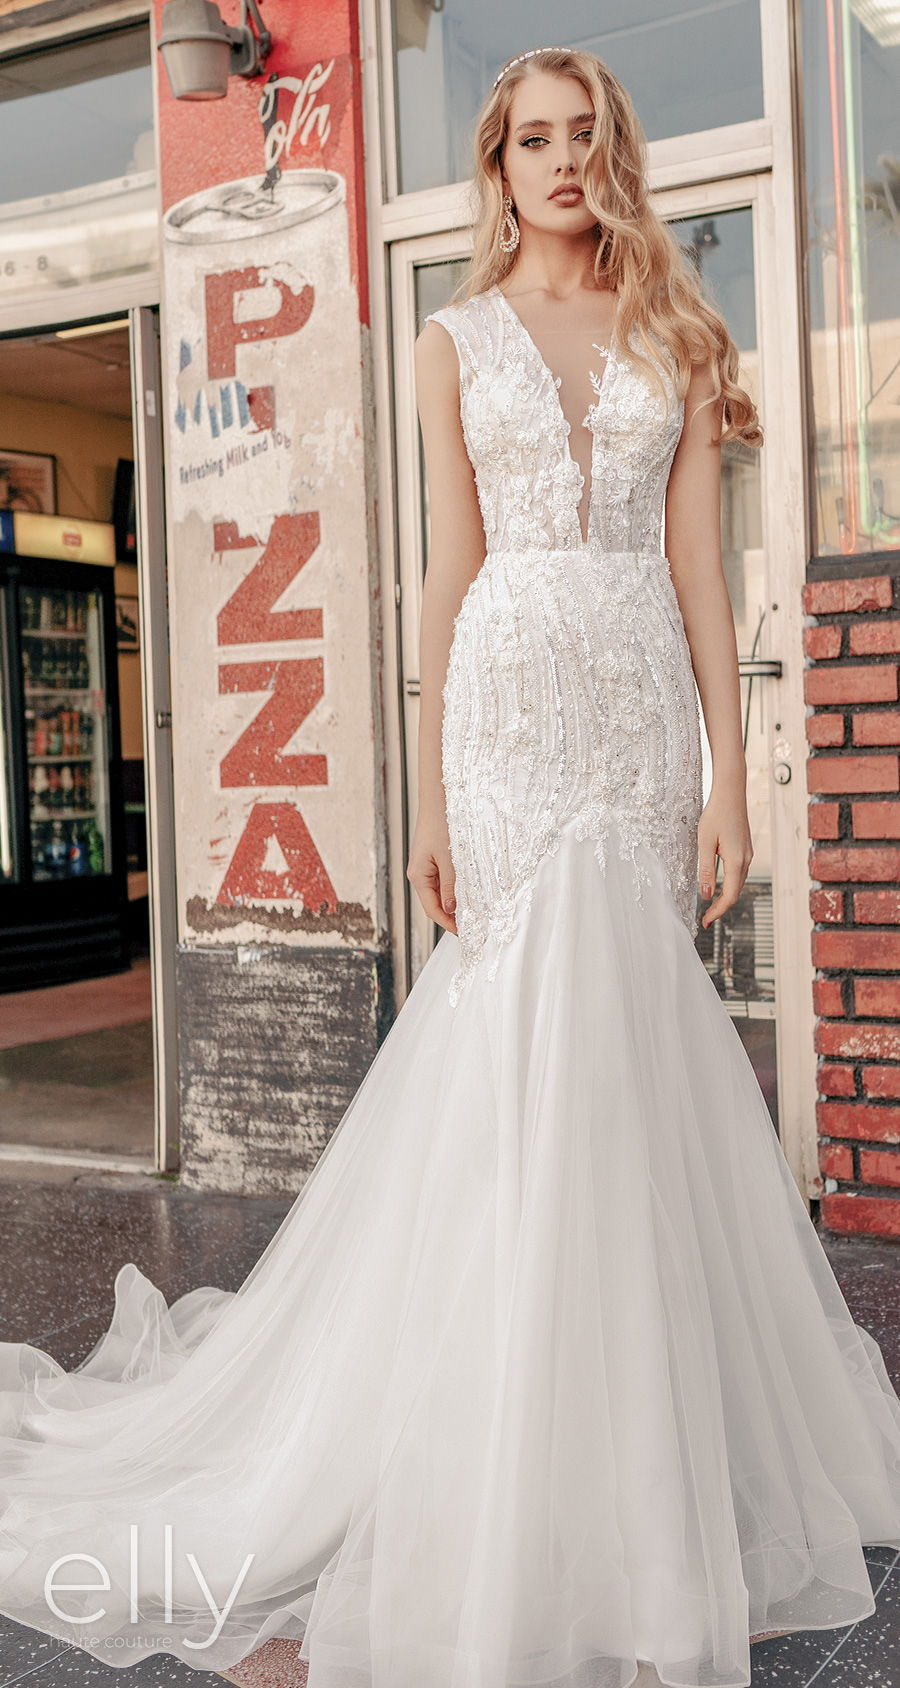 elly bride 2021 los angeles bridal sleeveless deep v neck heavily embellished bodice glamorous mermaid wedding dress covered back chapel train (adeline) mv